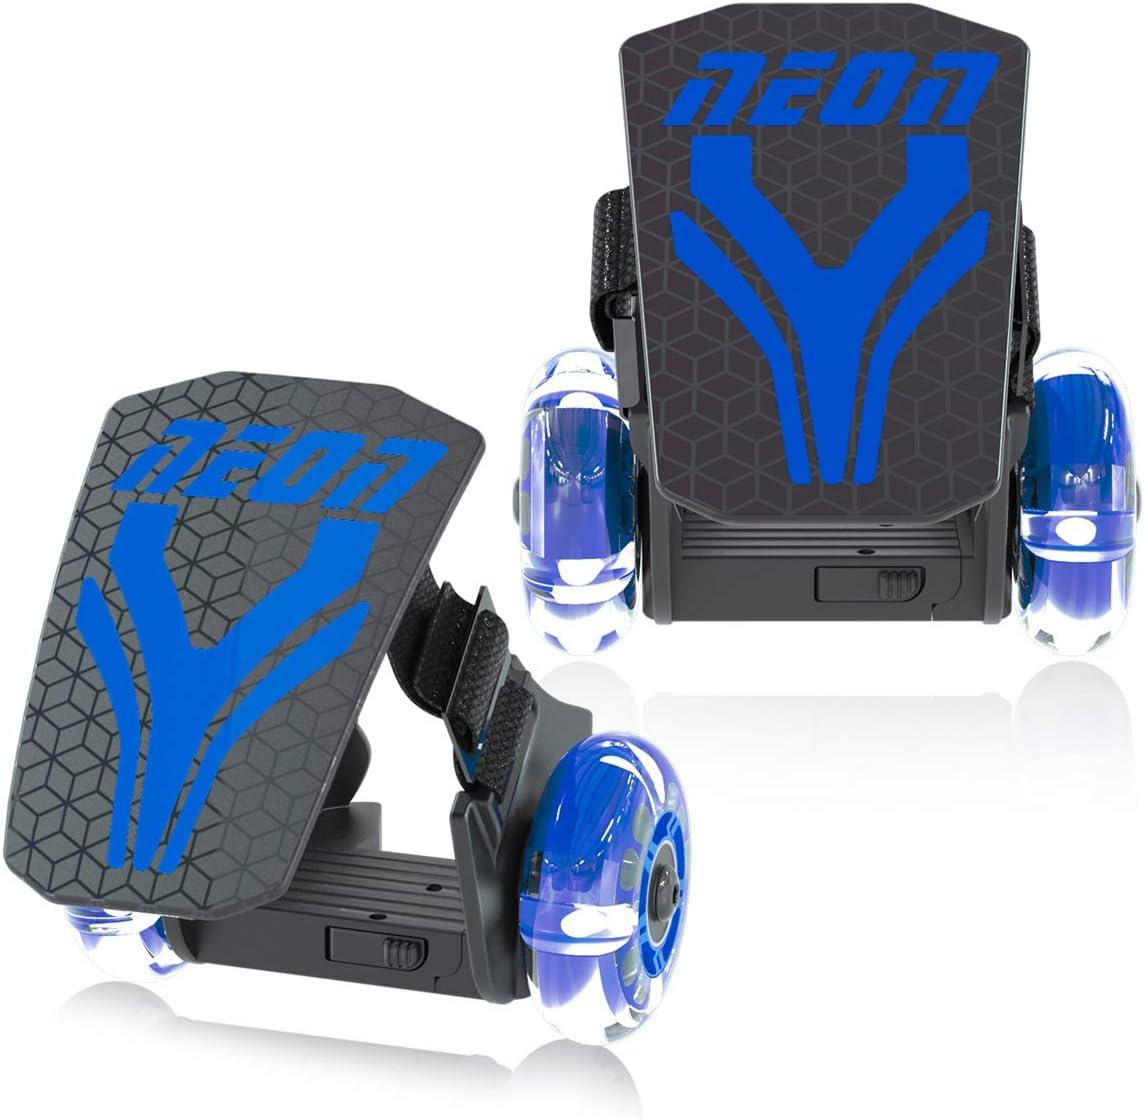 Flashing Heel Wheels Clip on Skates for